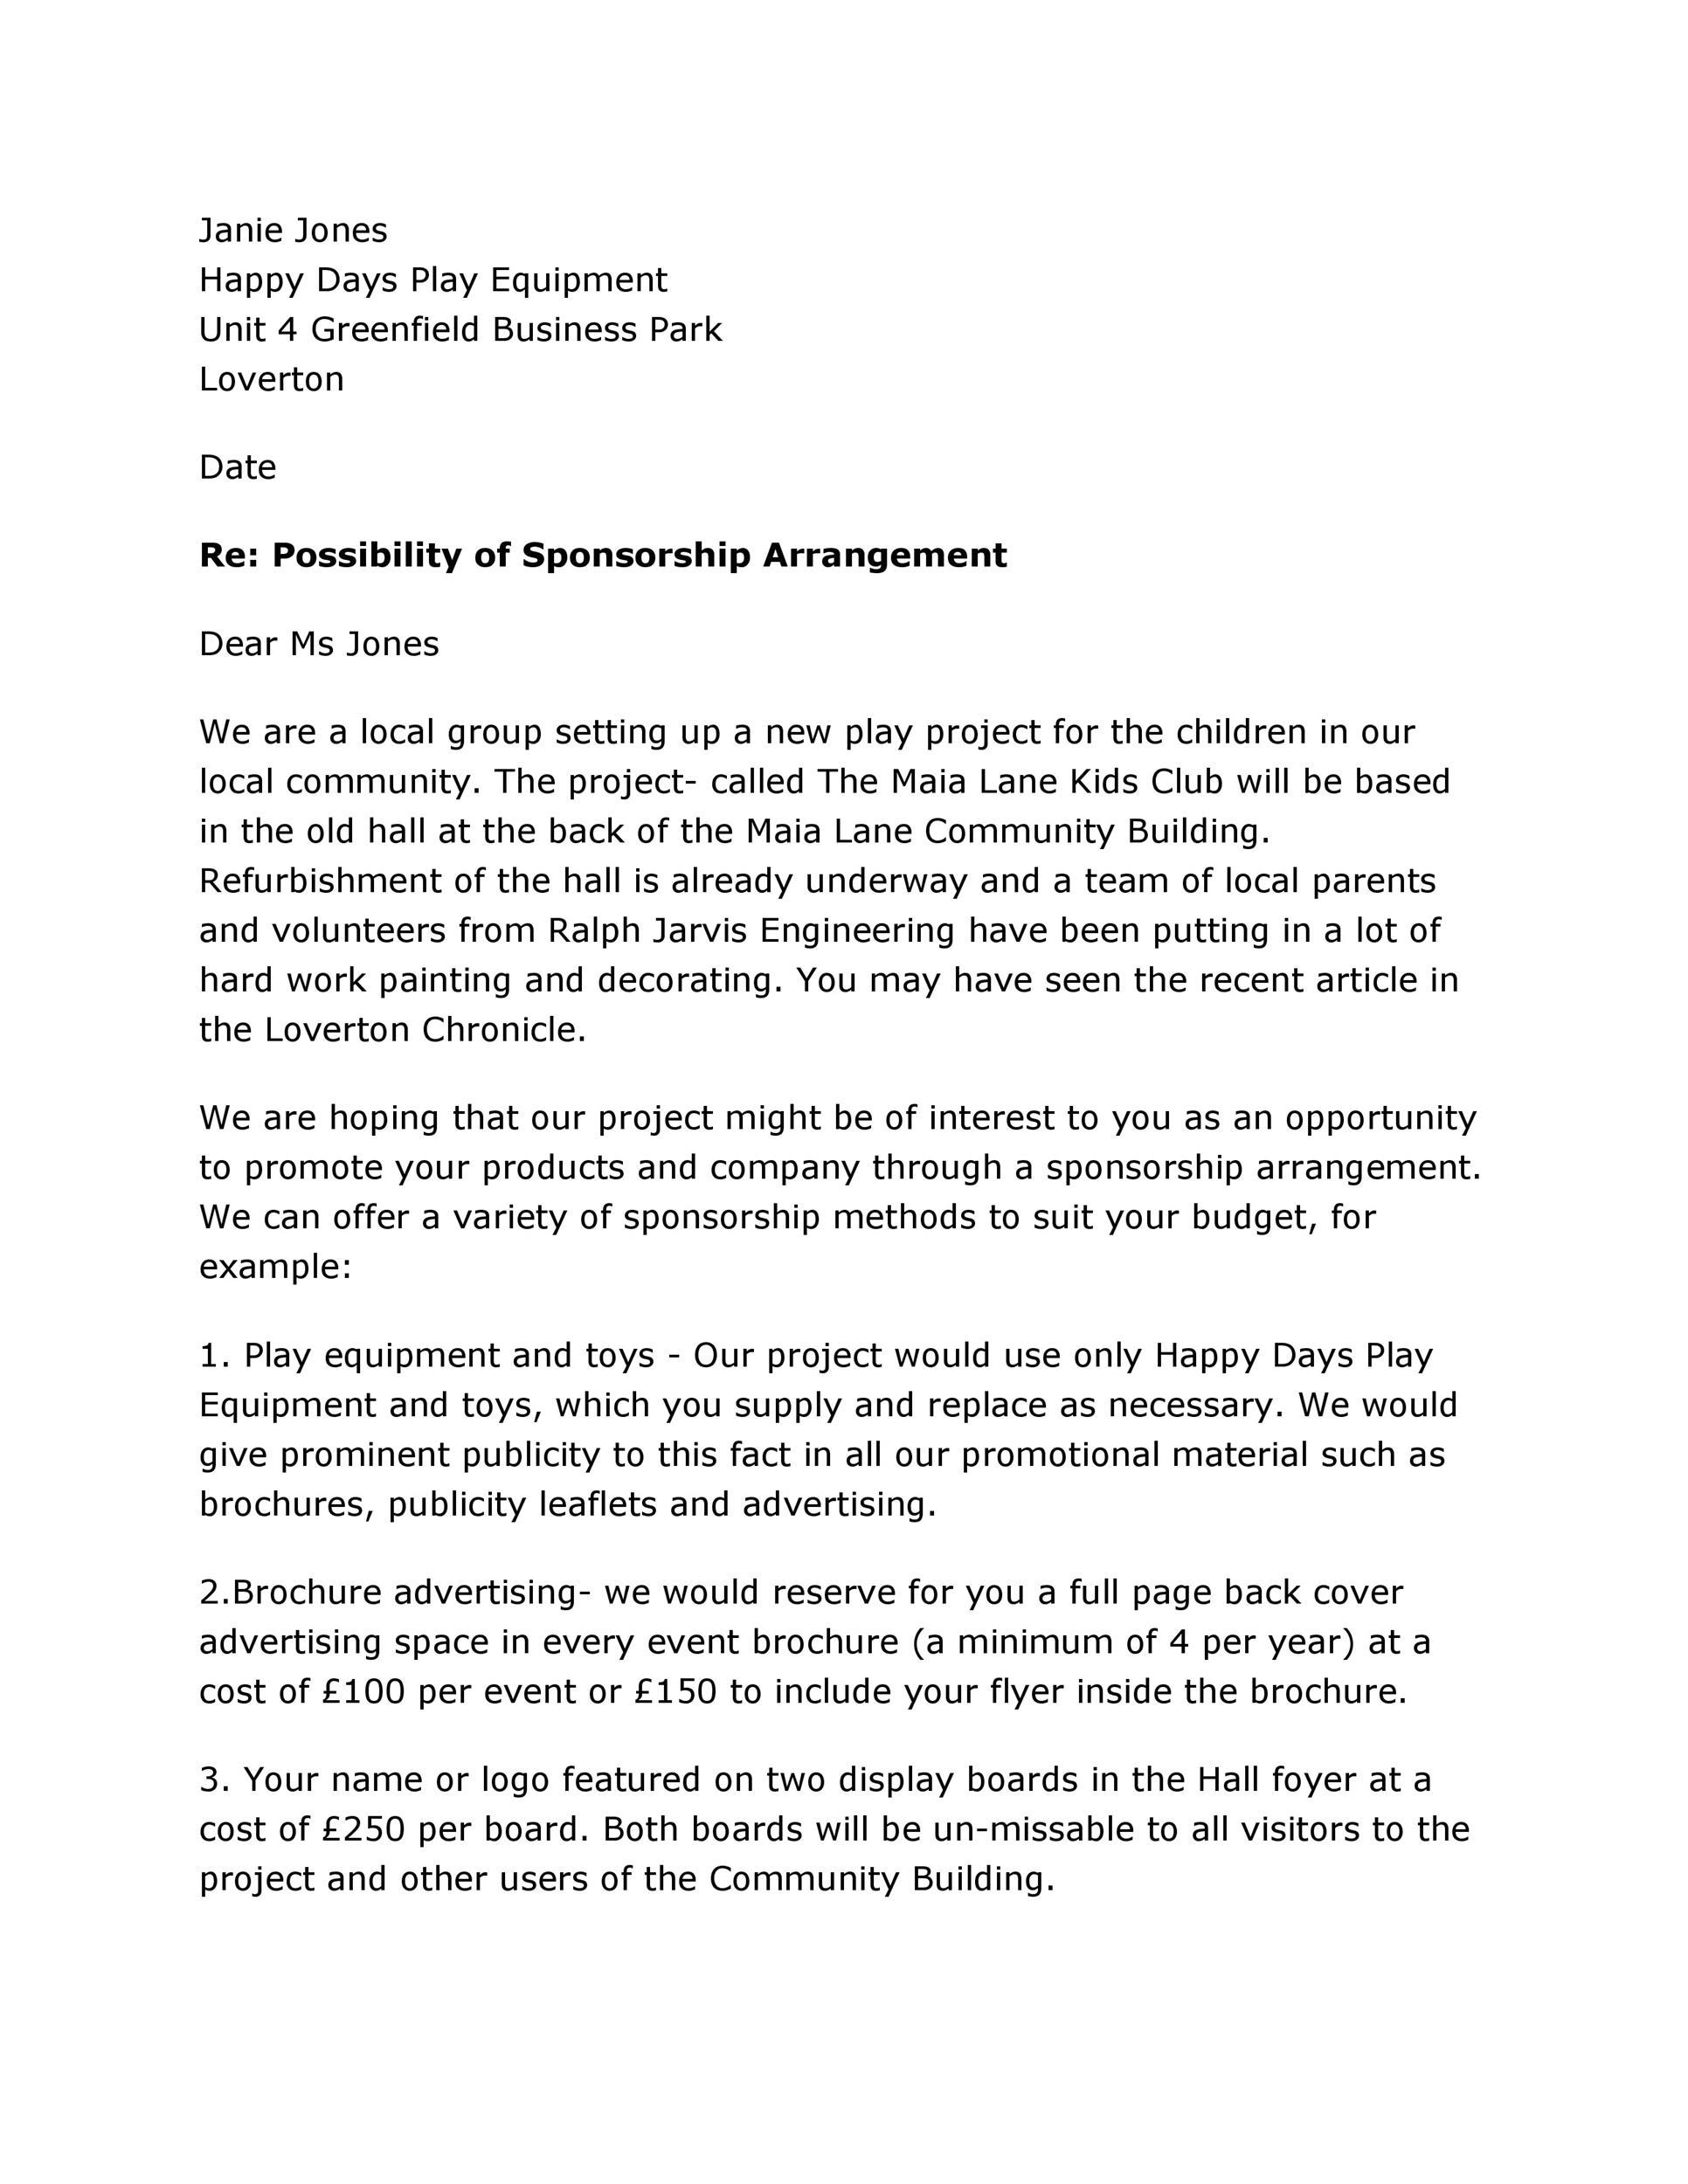 732894 sponsorship proposal cover letter sponsorship - Cover Letter For Sponsorship Proposal